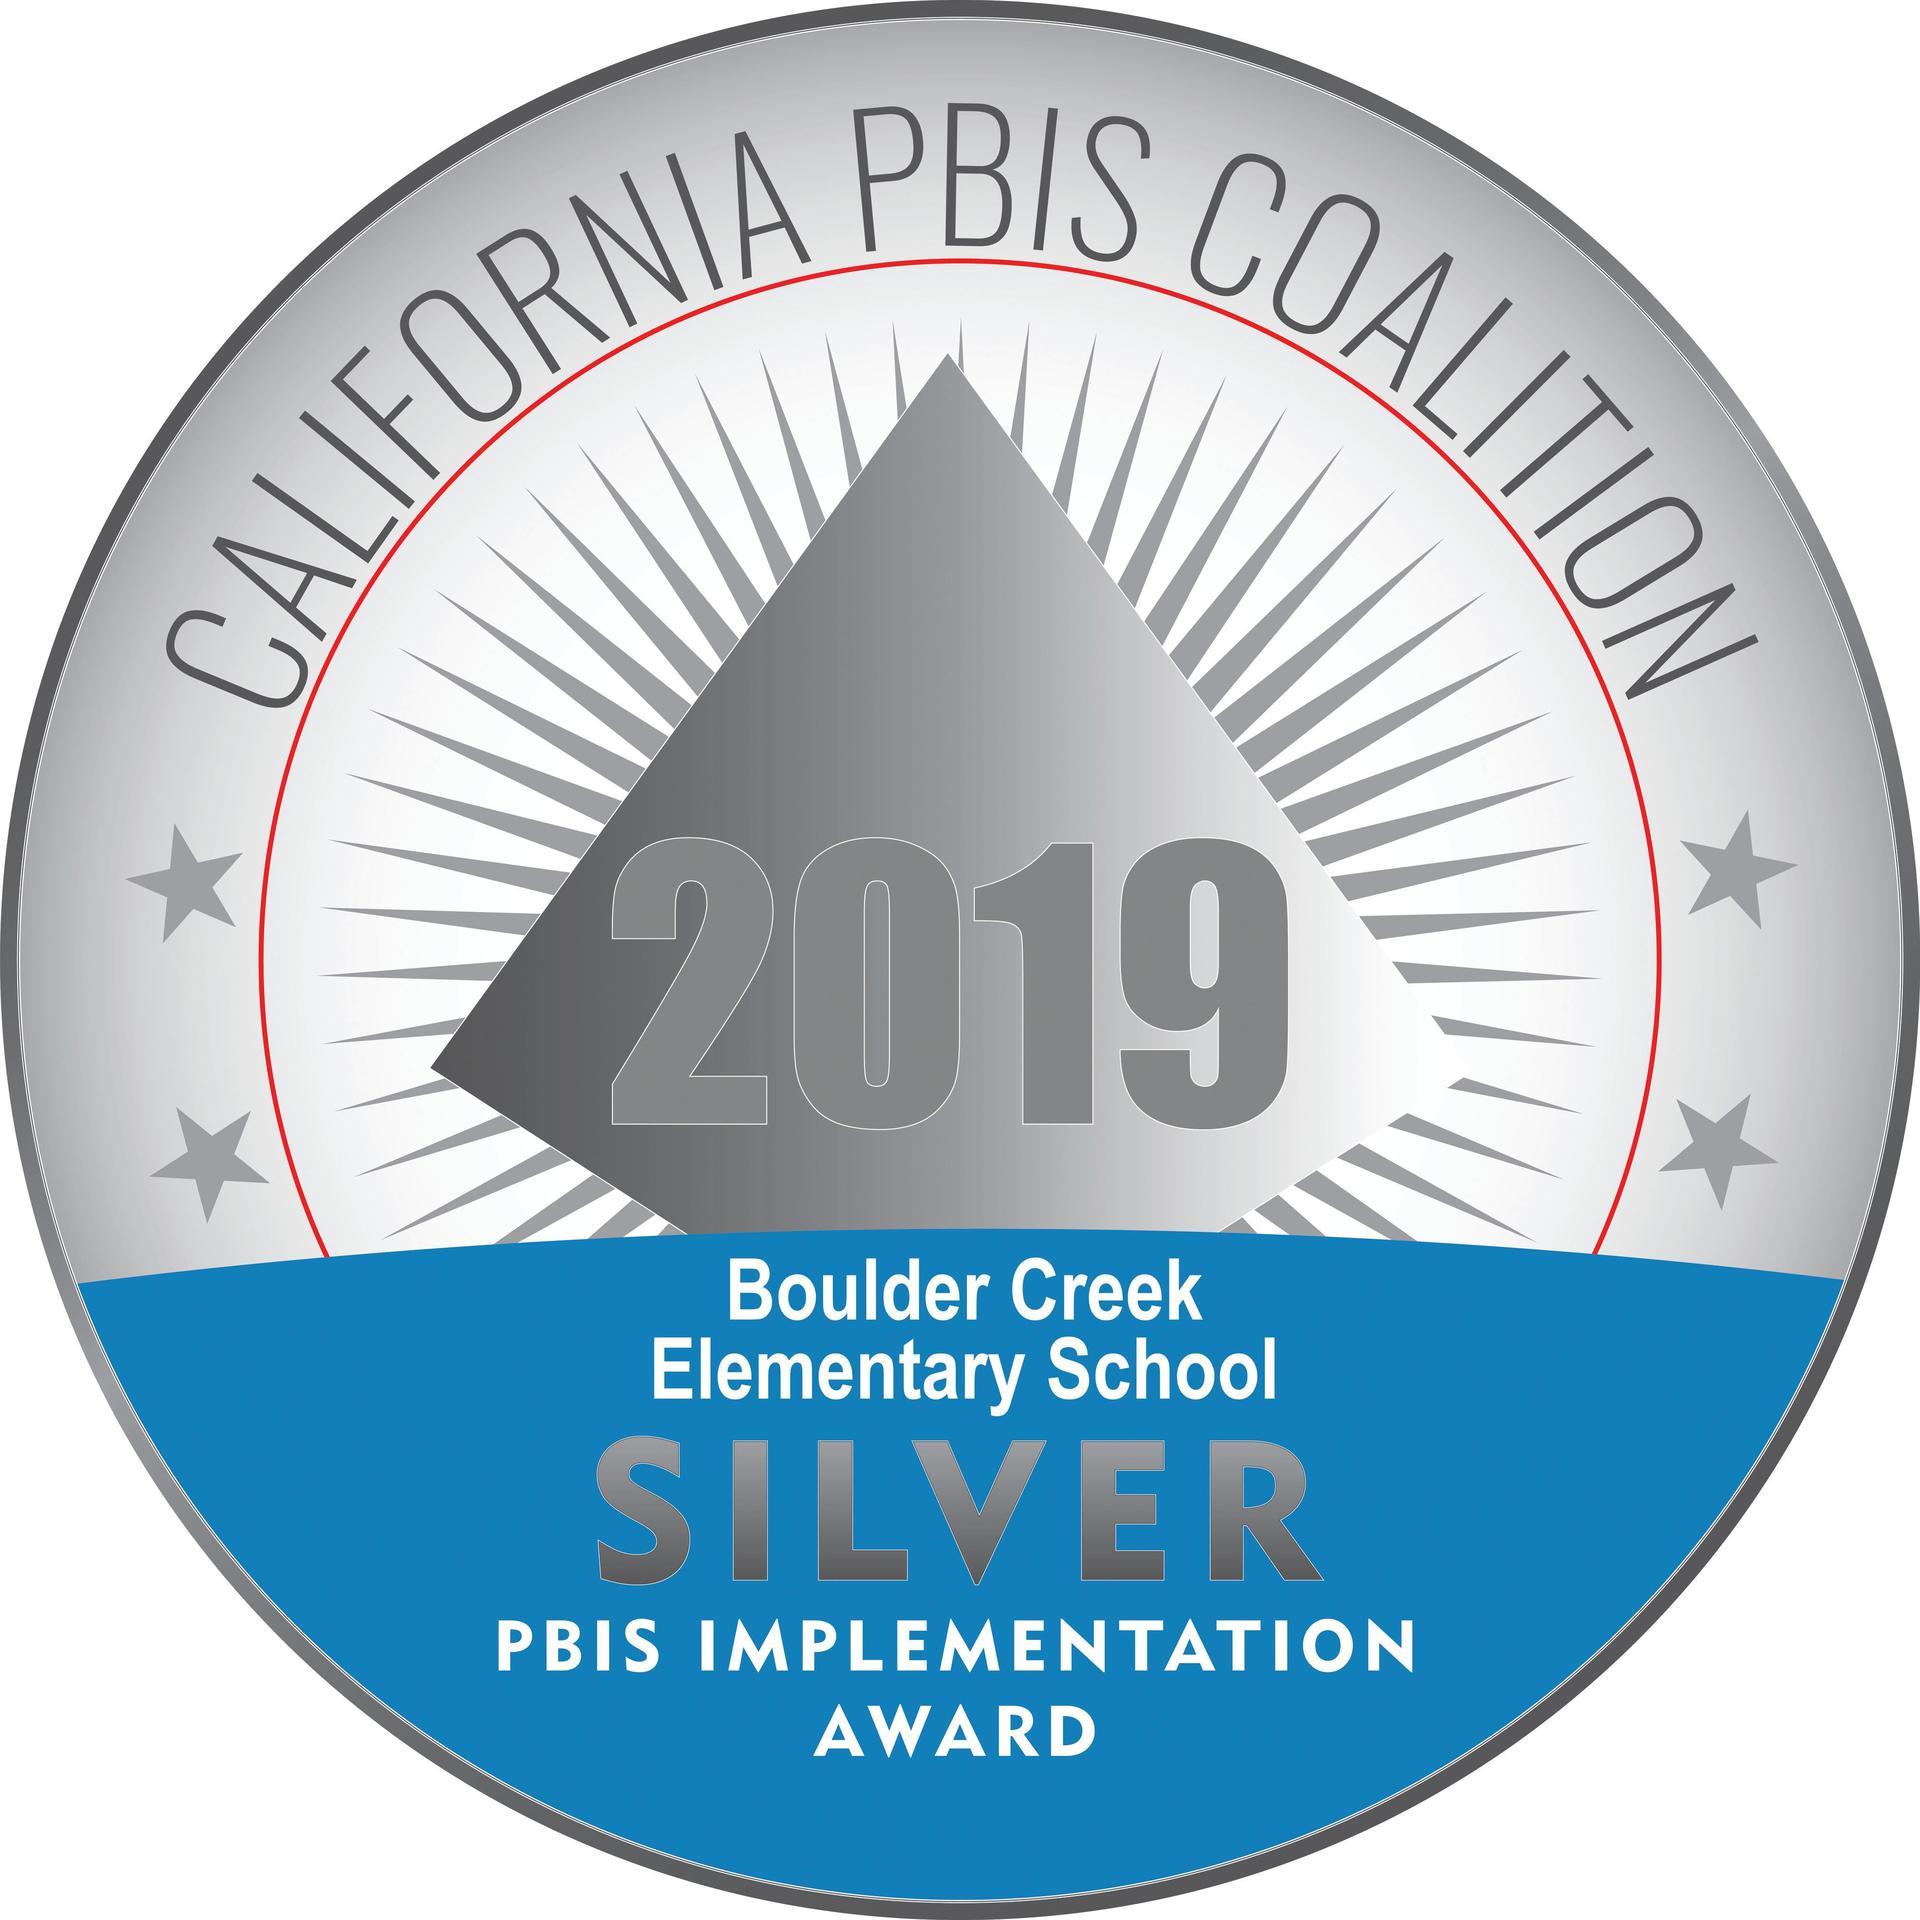 PBIS Award Silver Level